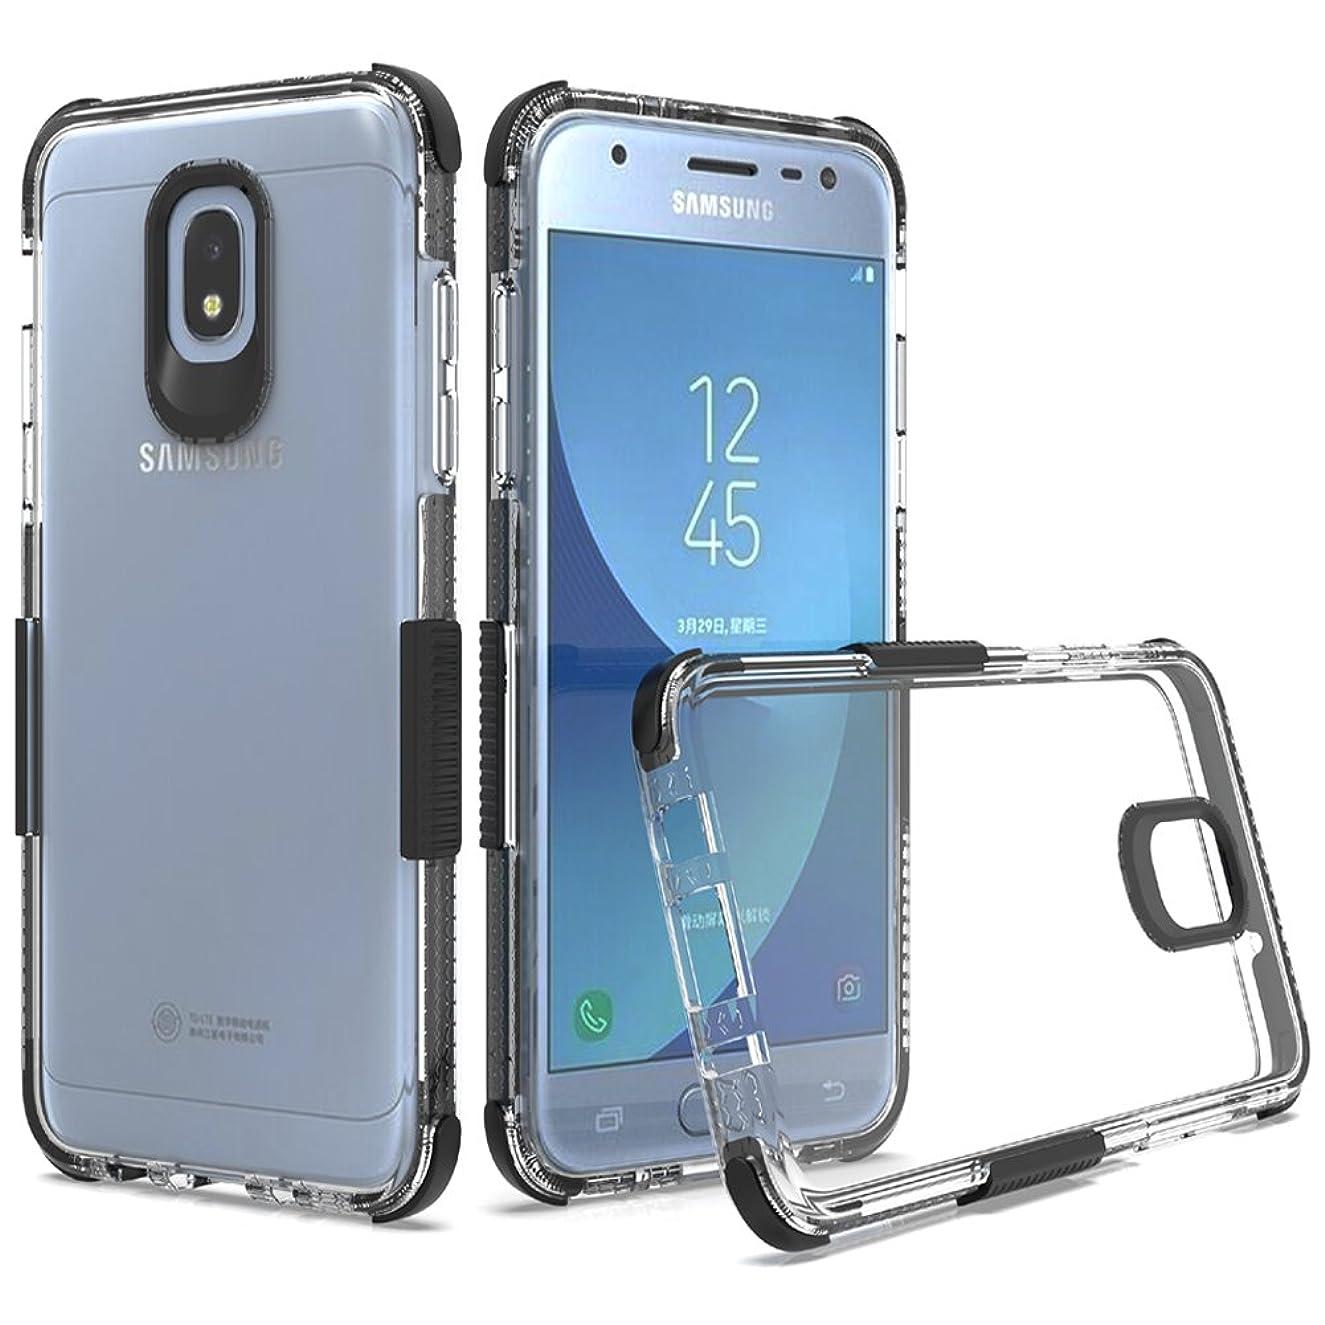 for Samsung Galaxy J7 2018/J7 V 2nd Gen/J7 Aero/J7 Top/J7 Refine/J7 Eon/J7 Star/J7 Crown/J7 Aura Case, Dretal Crystal Double Color TPU Case Shock Absorption Flexible Protective Cover (Clear Black)